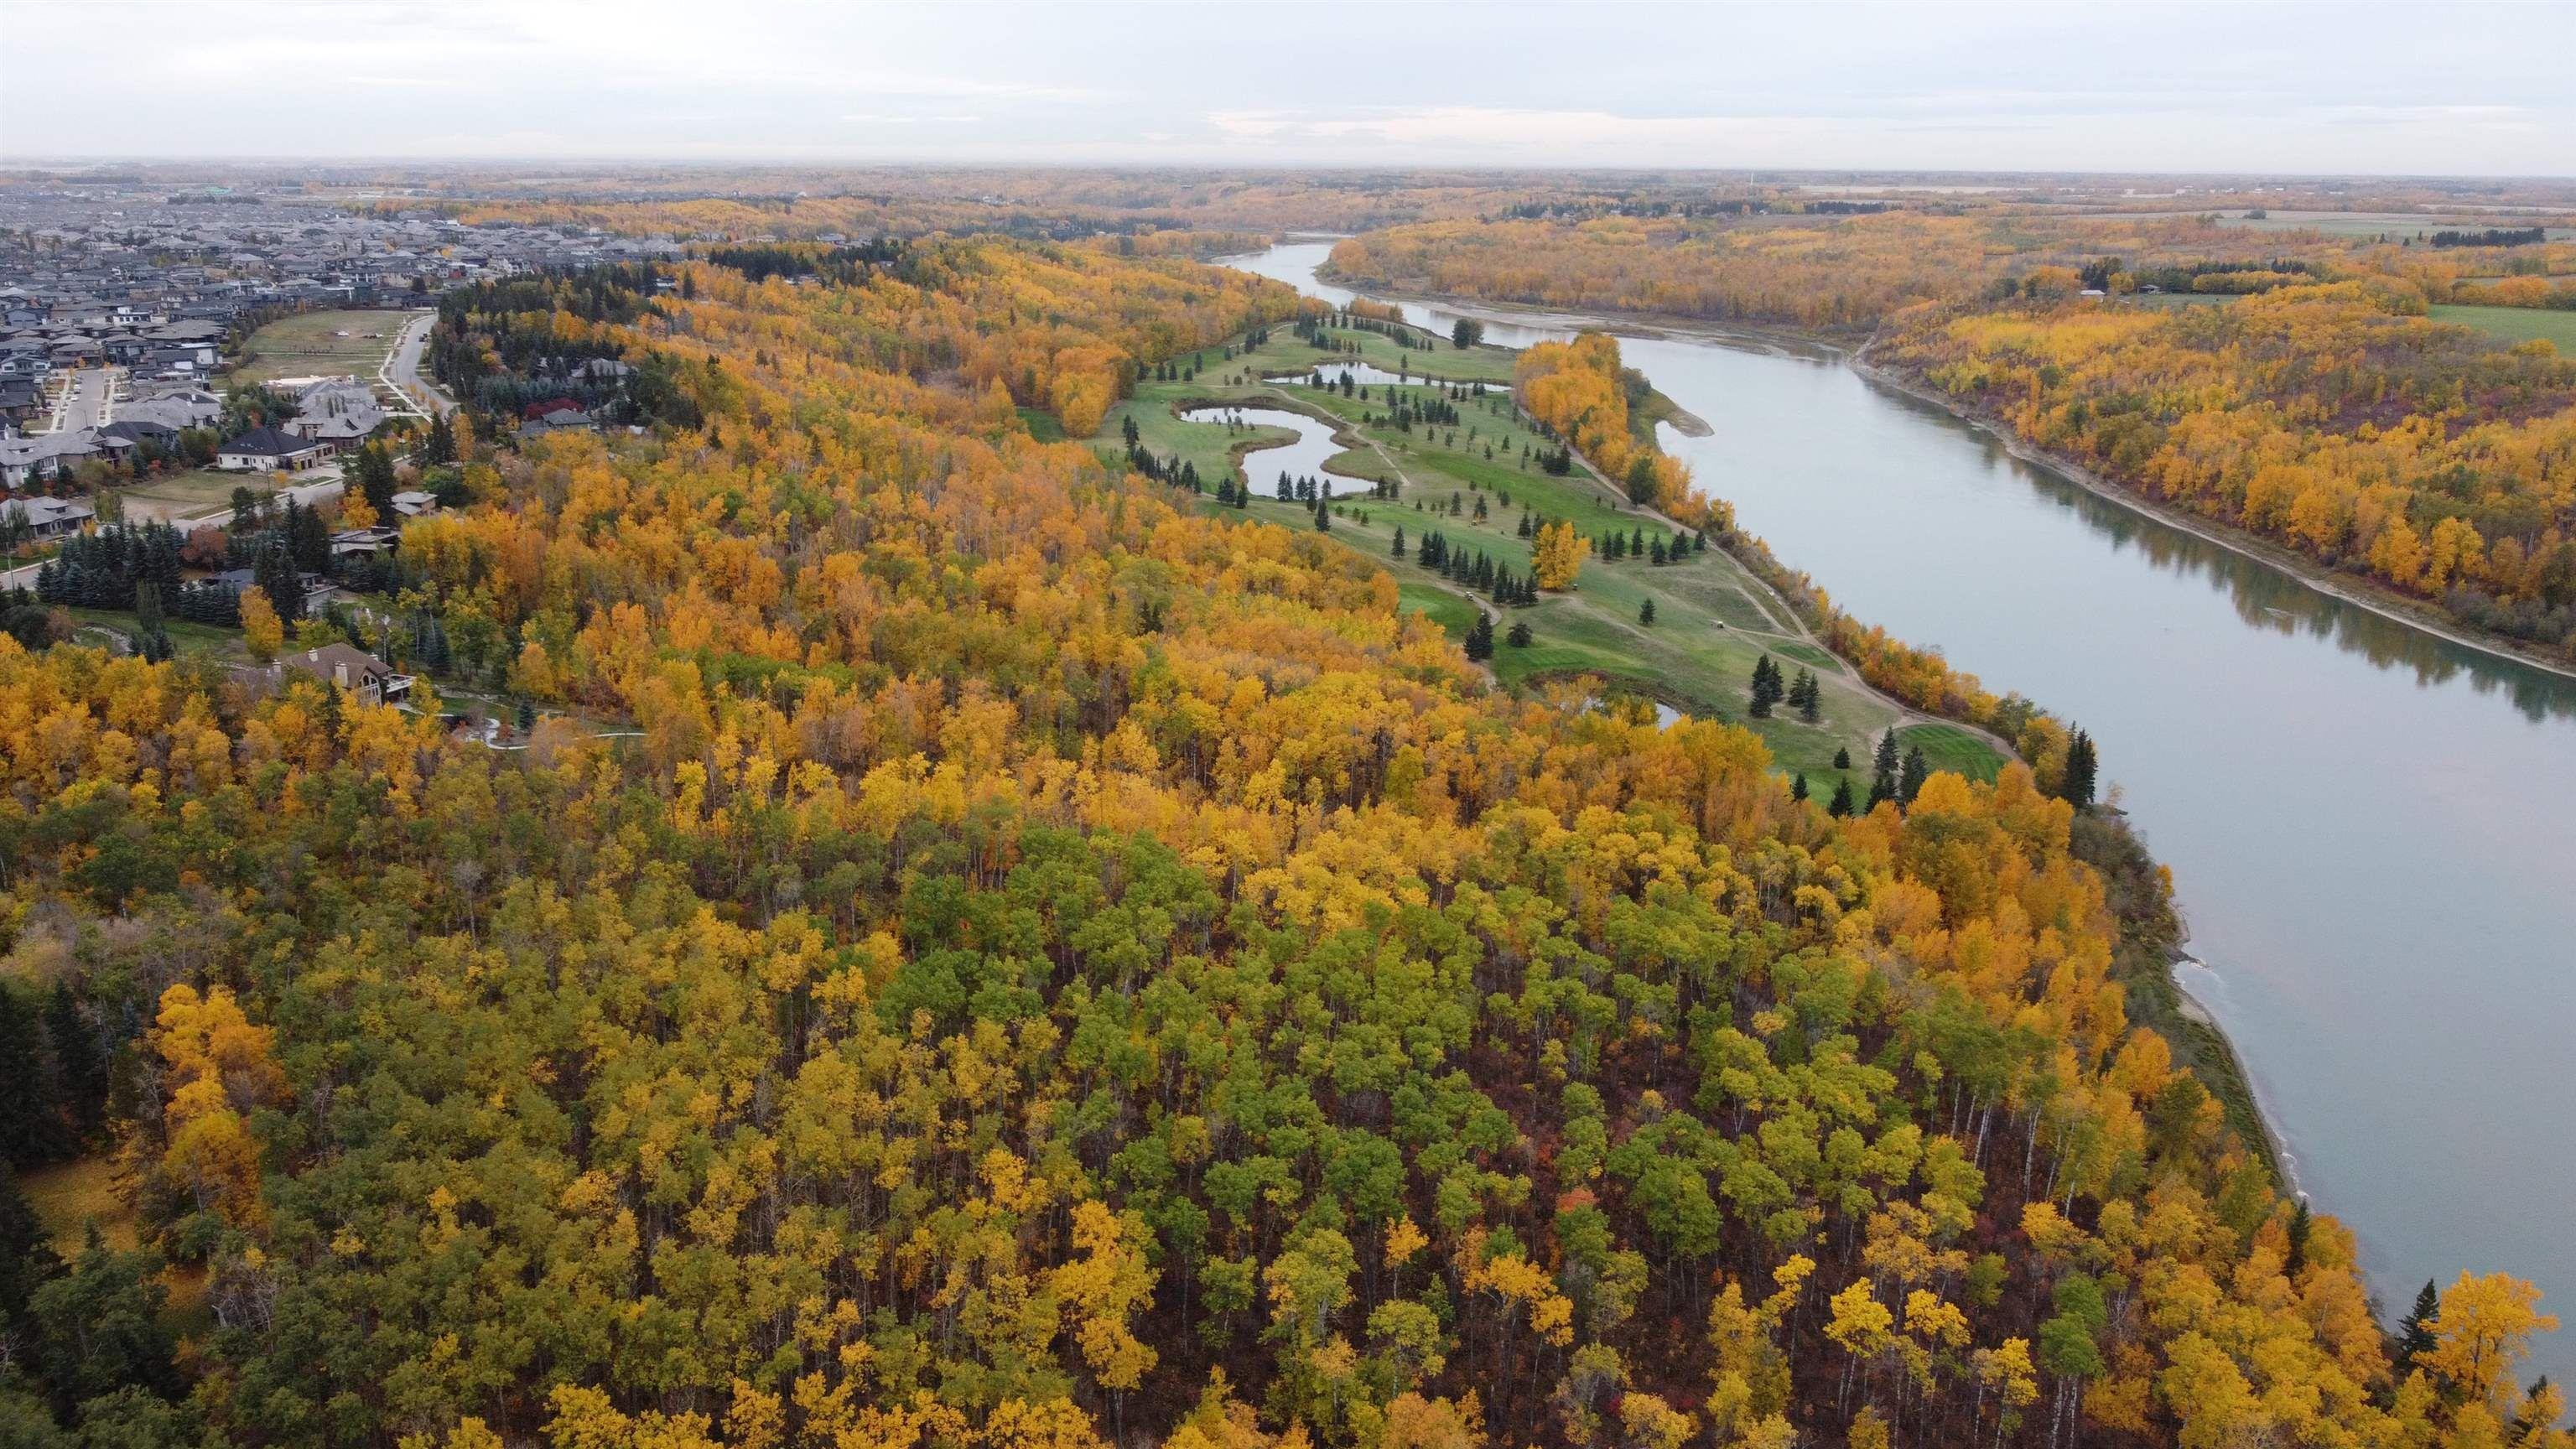 Main Photo: 17103 23 Avenue in Edmonton: Zone 56 Land Commercial for sale : MLS®# E4265906